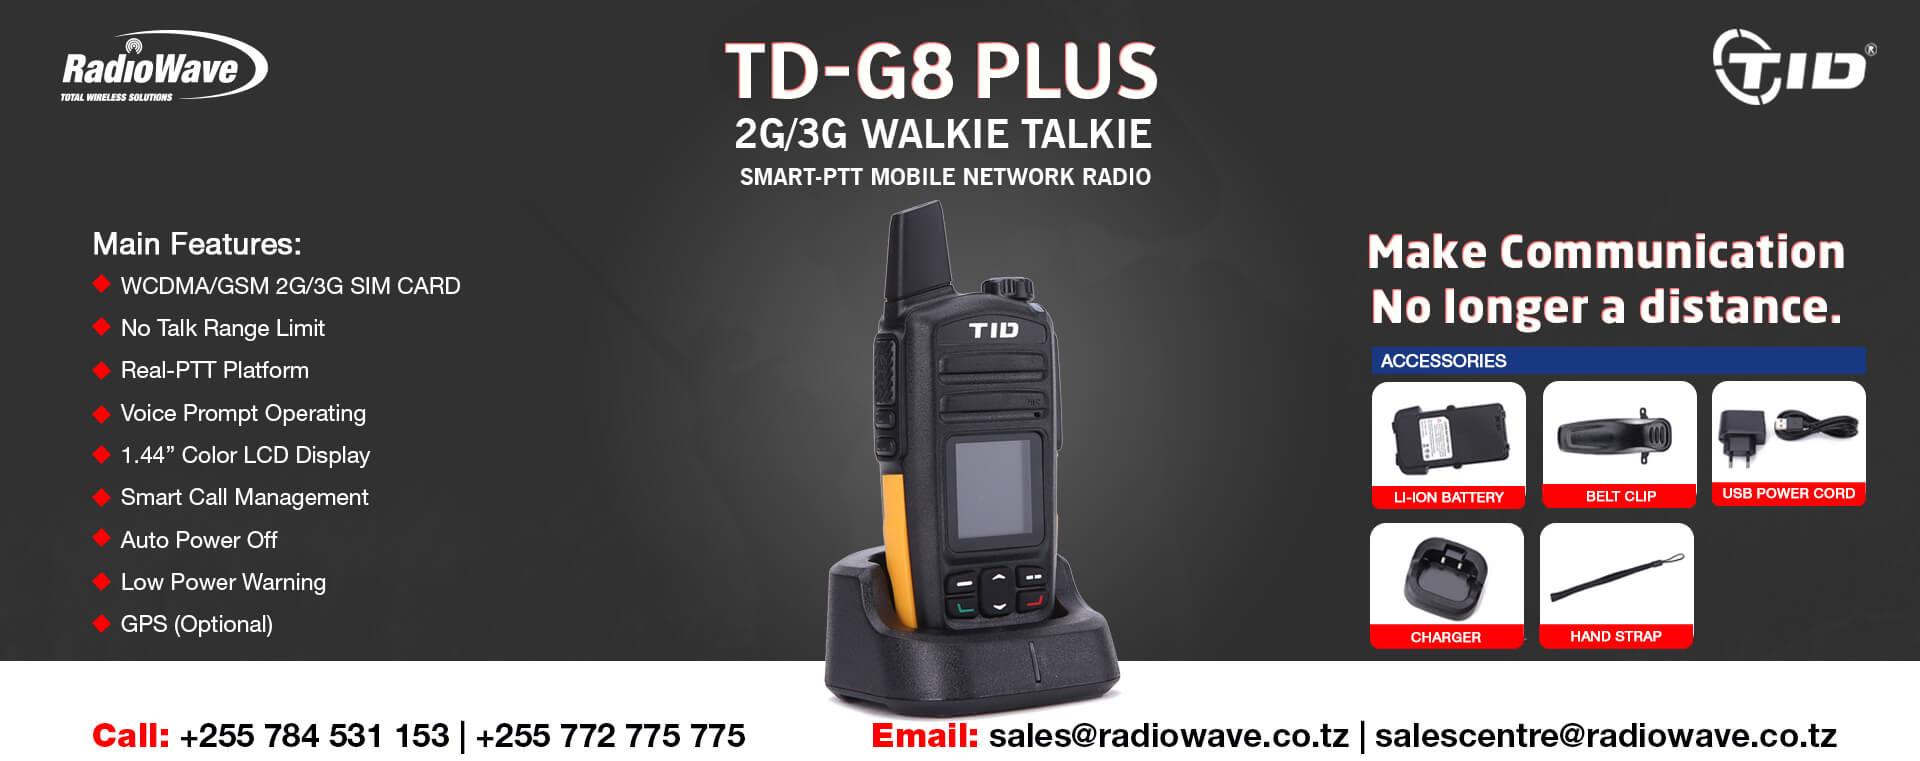 td-g8-plus-radio